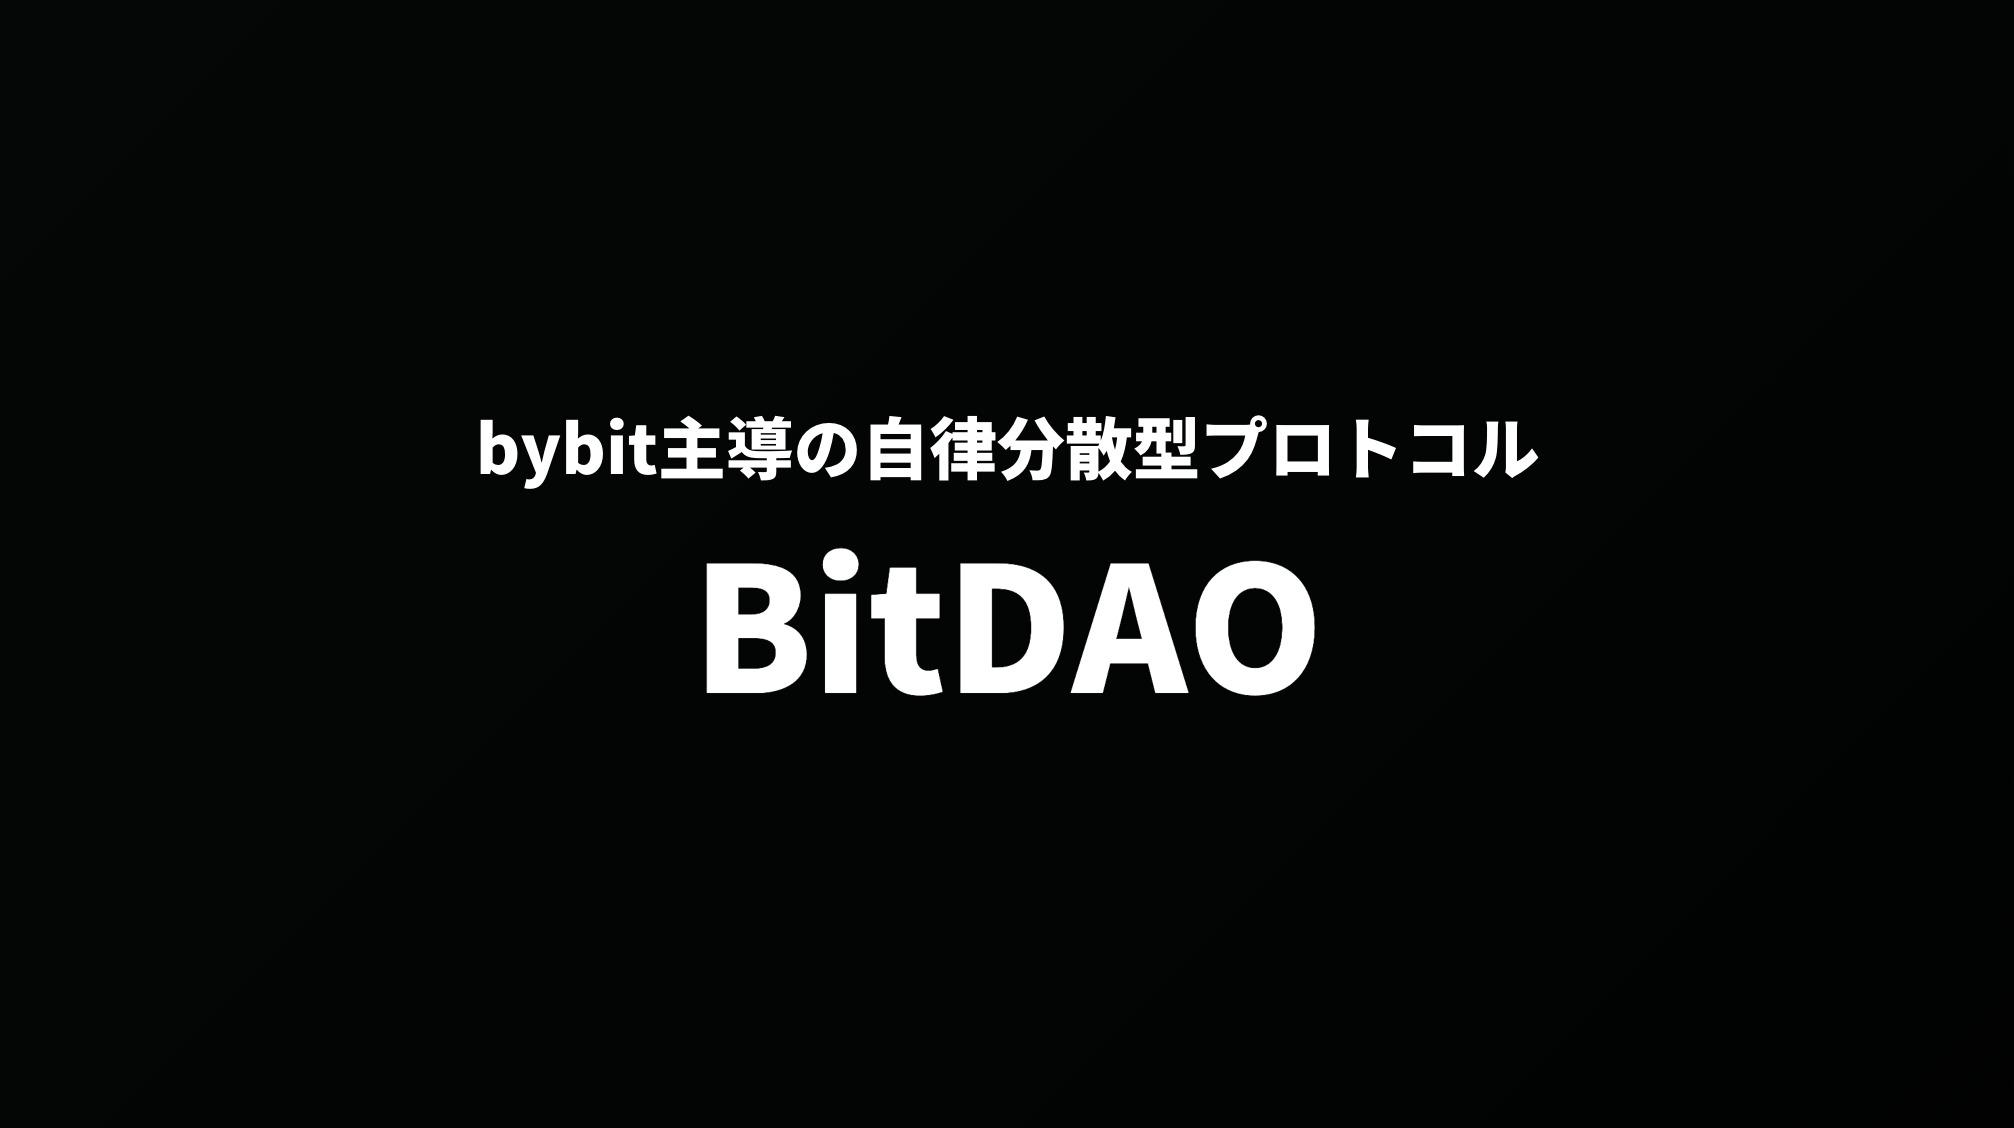 BybitがDeFiへ参入!?BitDAO(BIT Token)について徹底解説